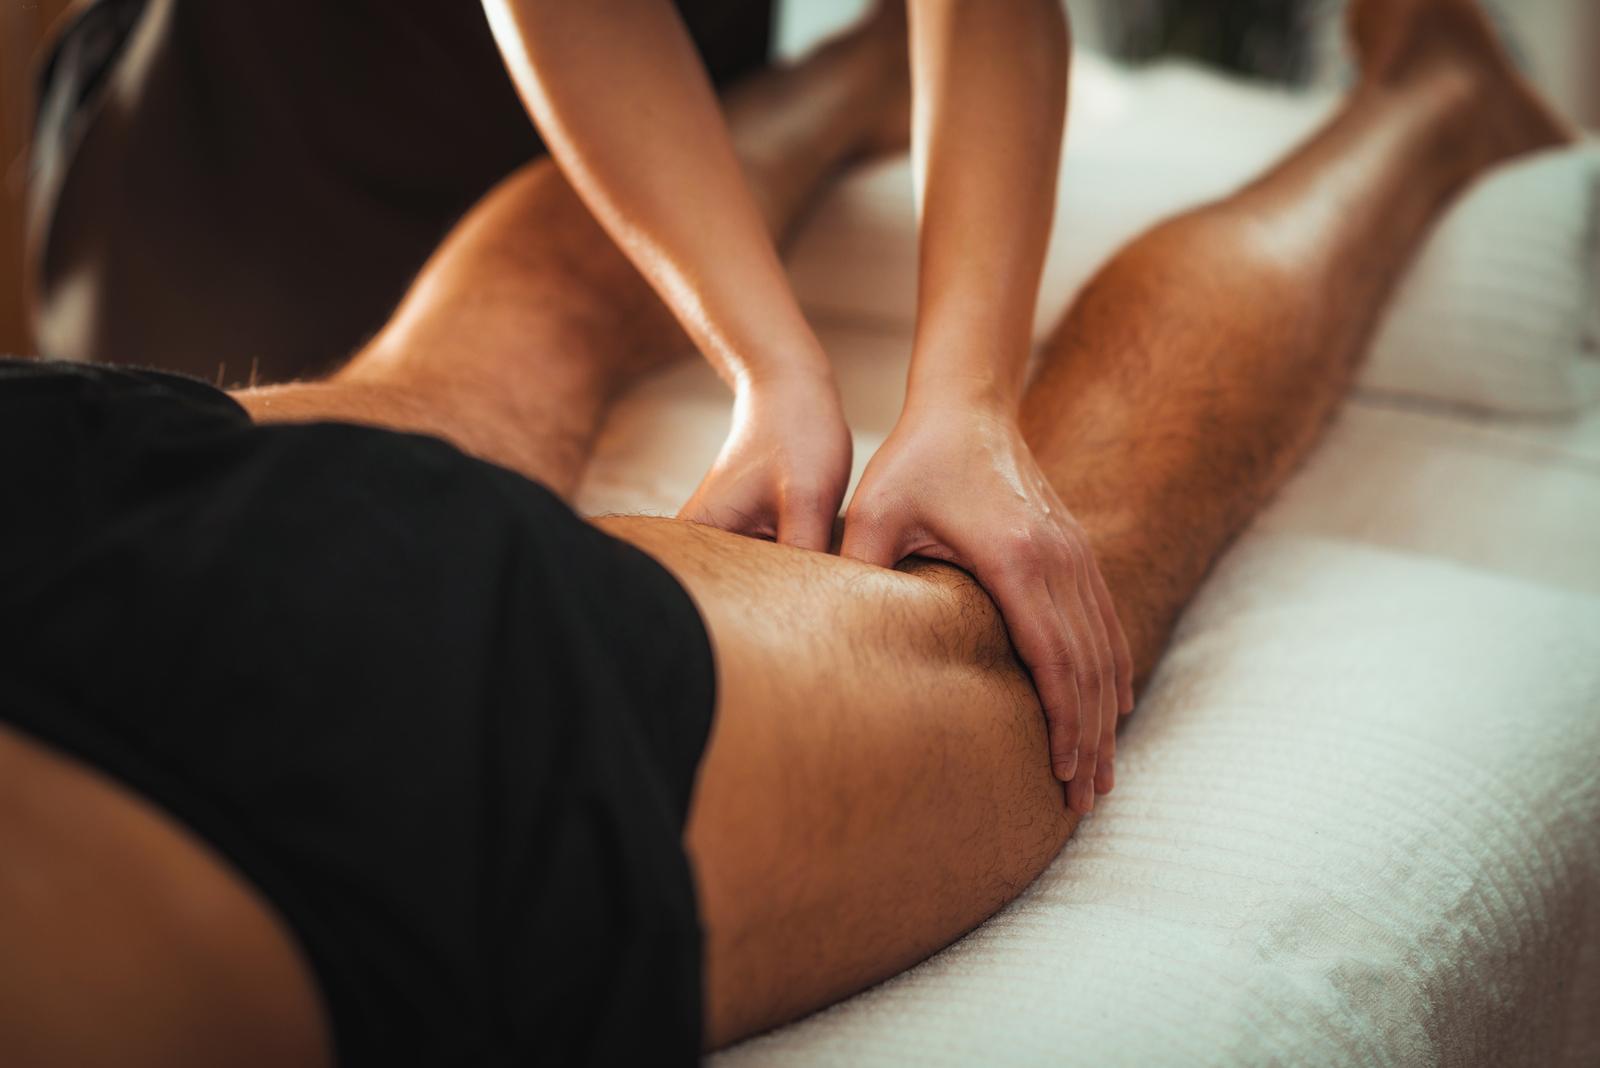 bigstock-Legs-Sports-Massage-Therapy-259976626.jpg